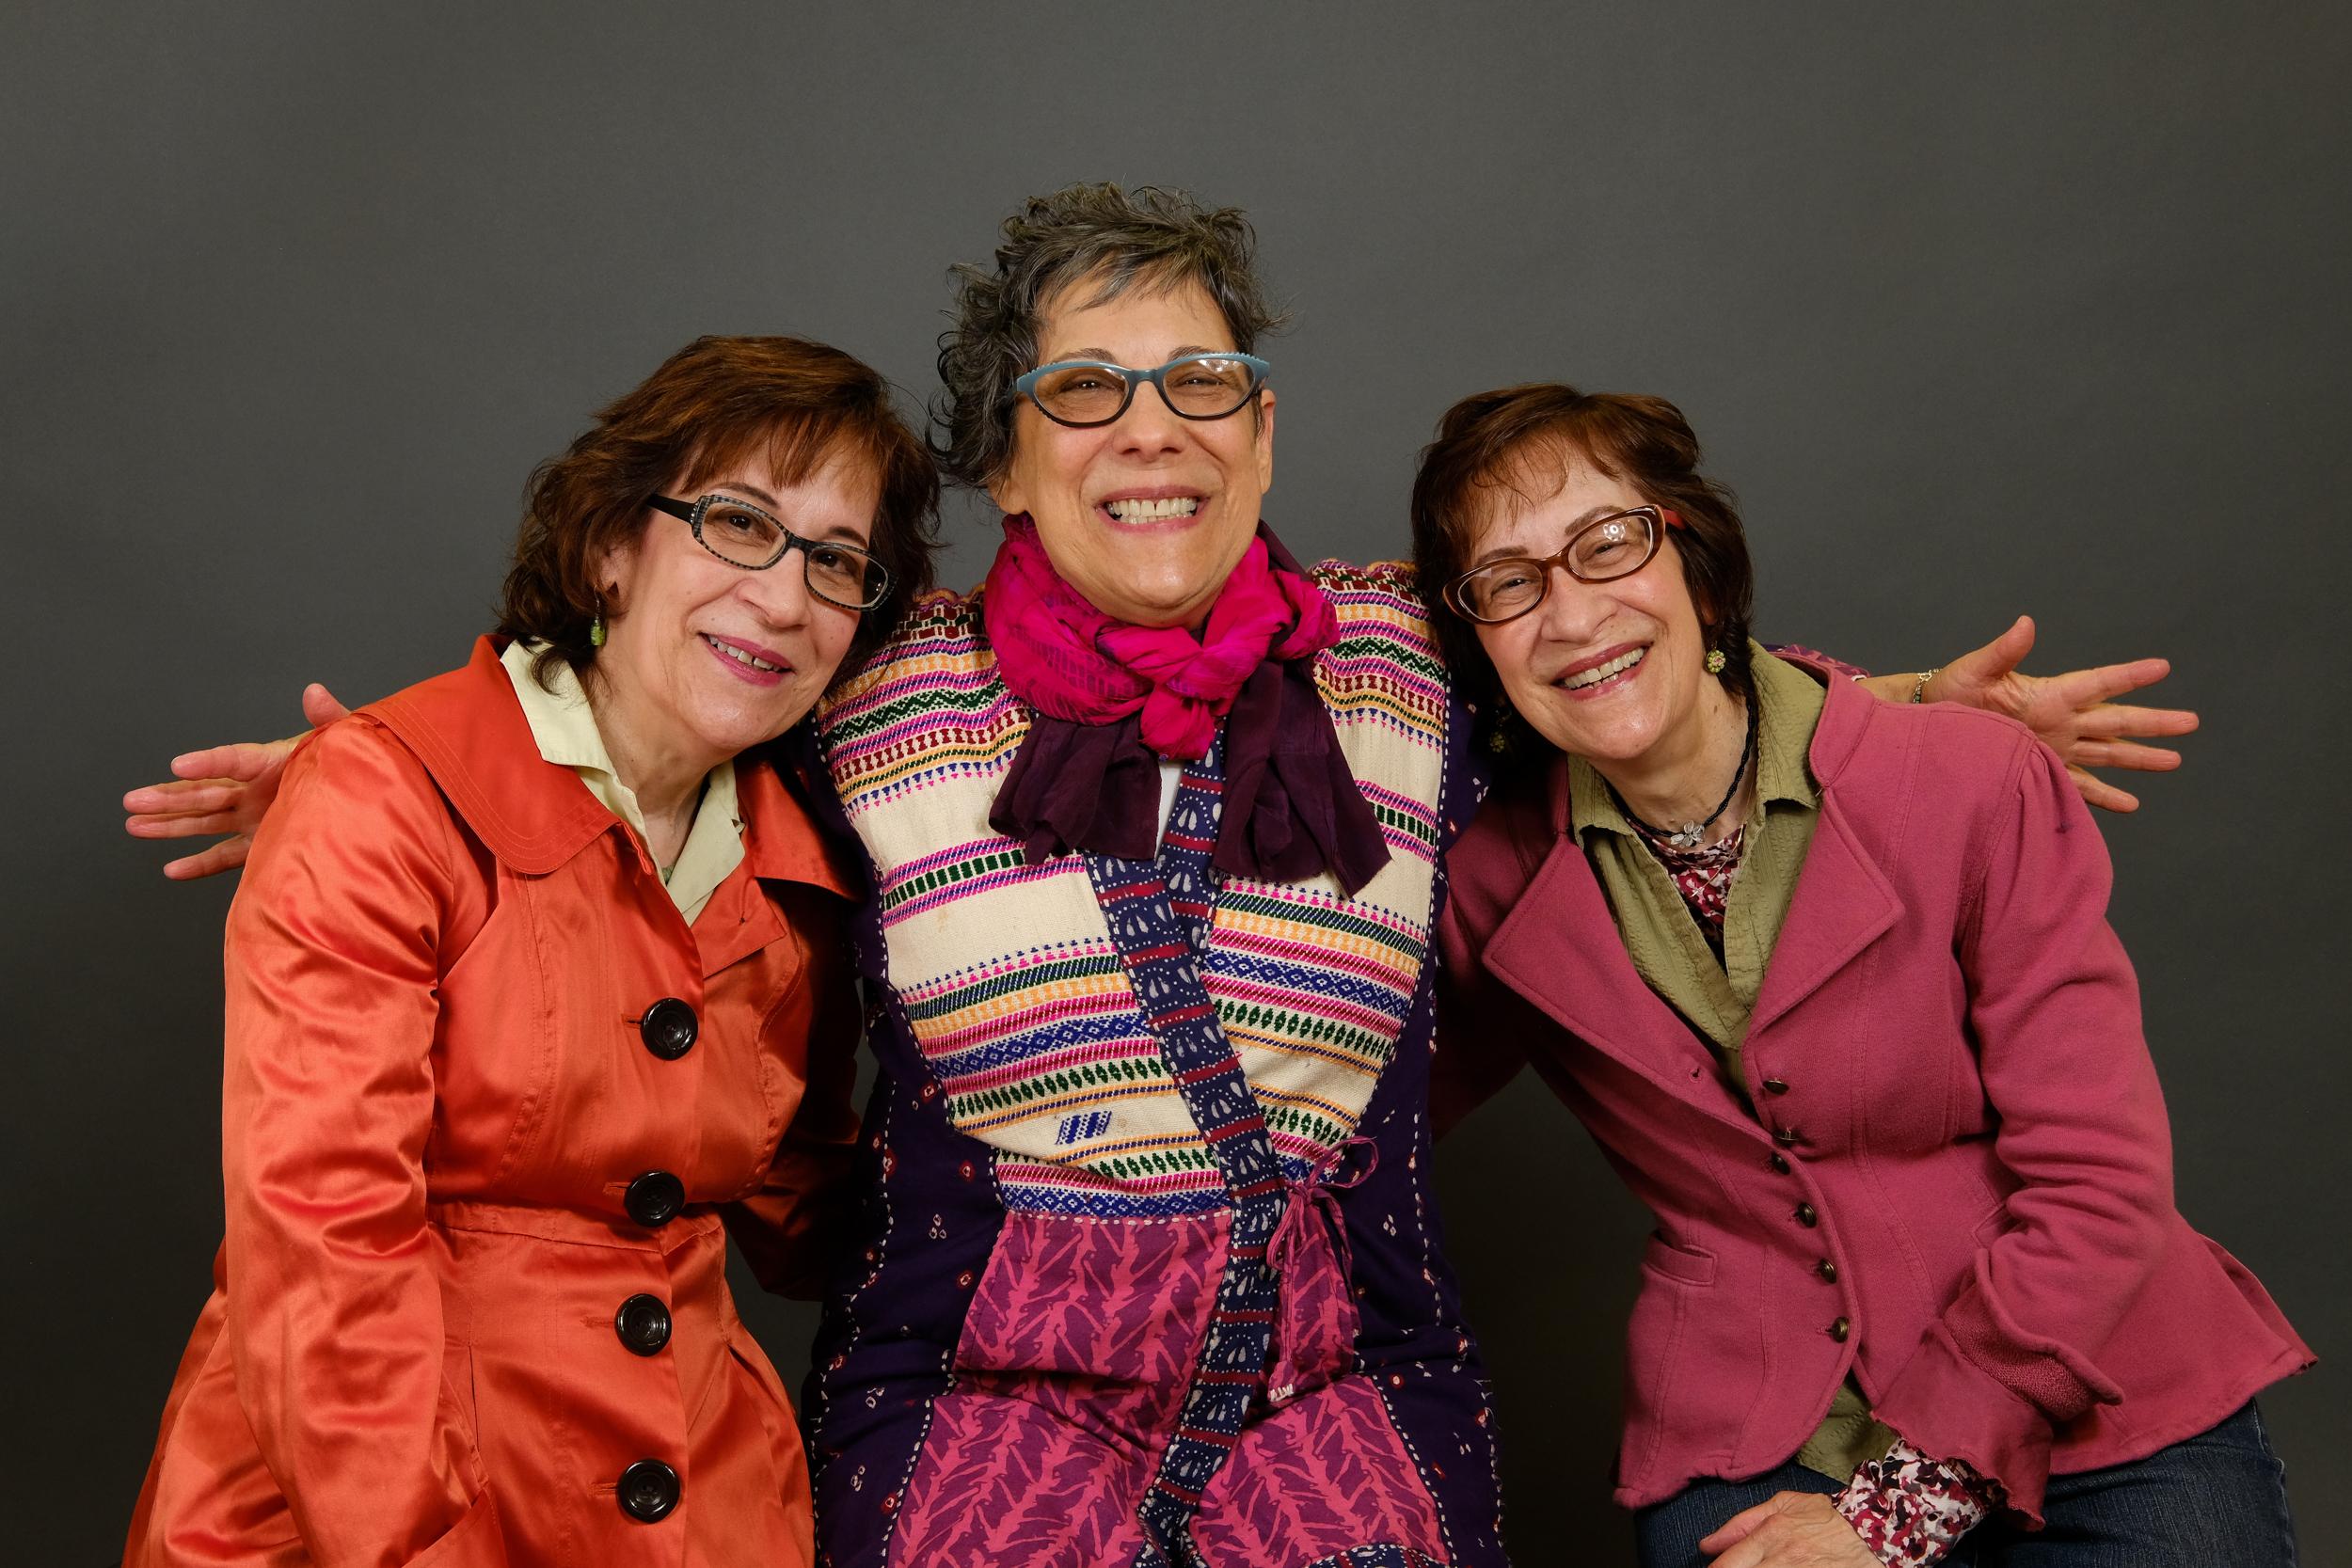 Laura, Deborah, and Leslie Hirshfield